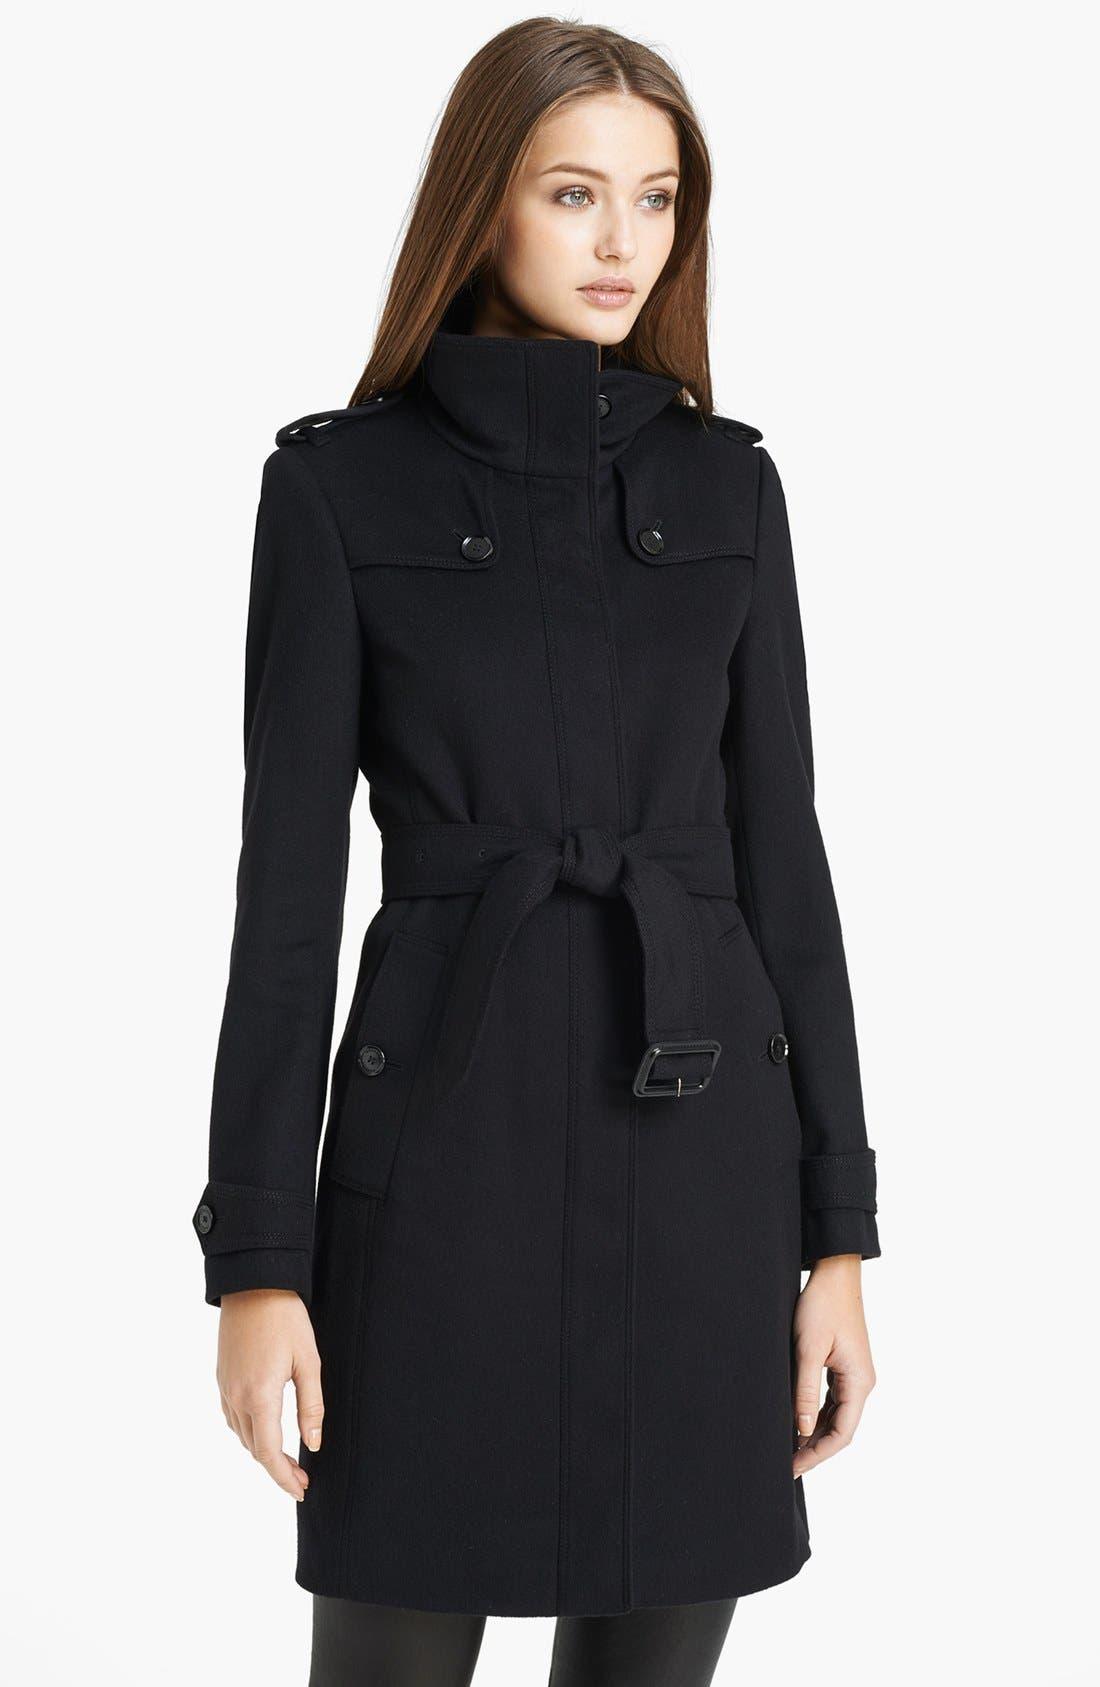 Alternate Image 1 Selected - Burberry London 'Basingstoke' Wool & Cashmere Coat